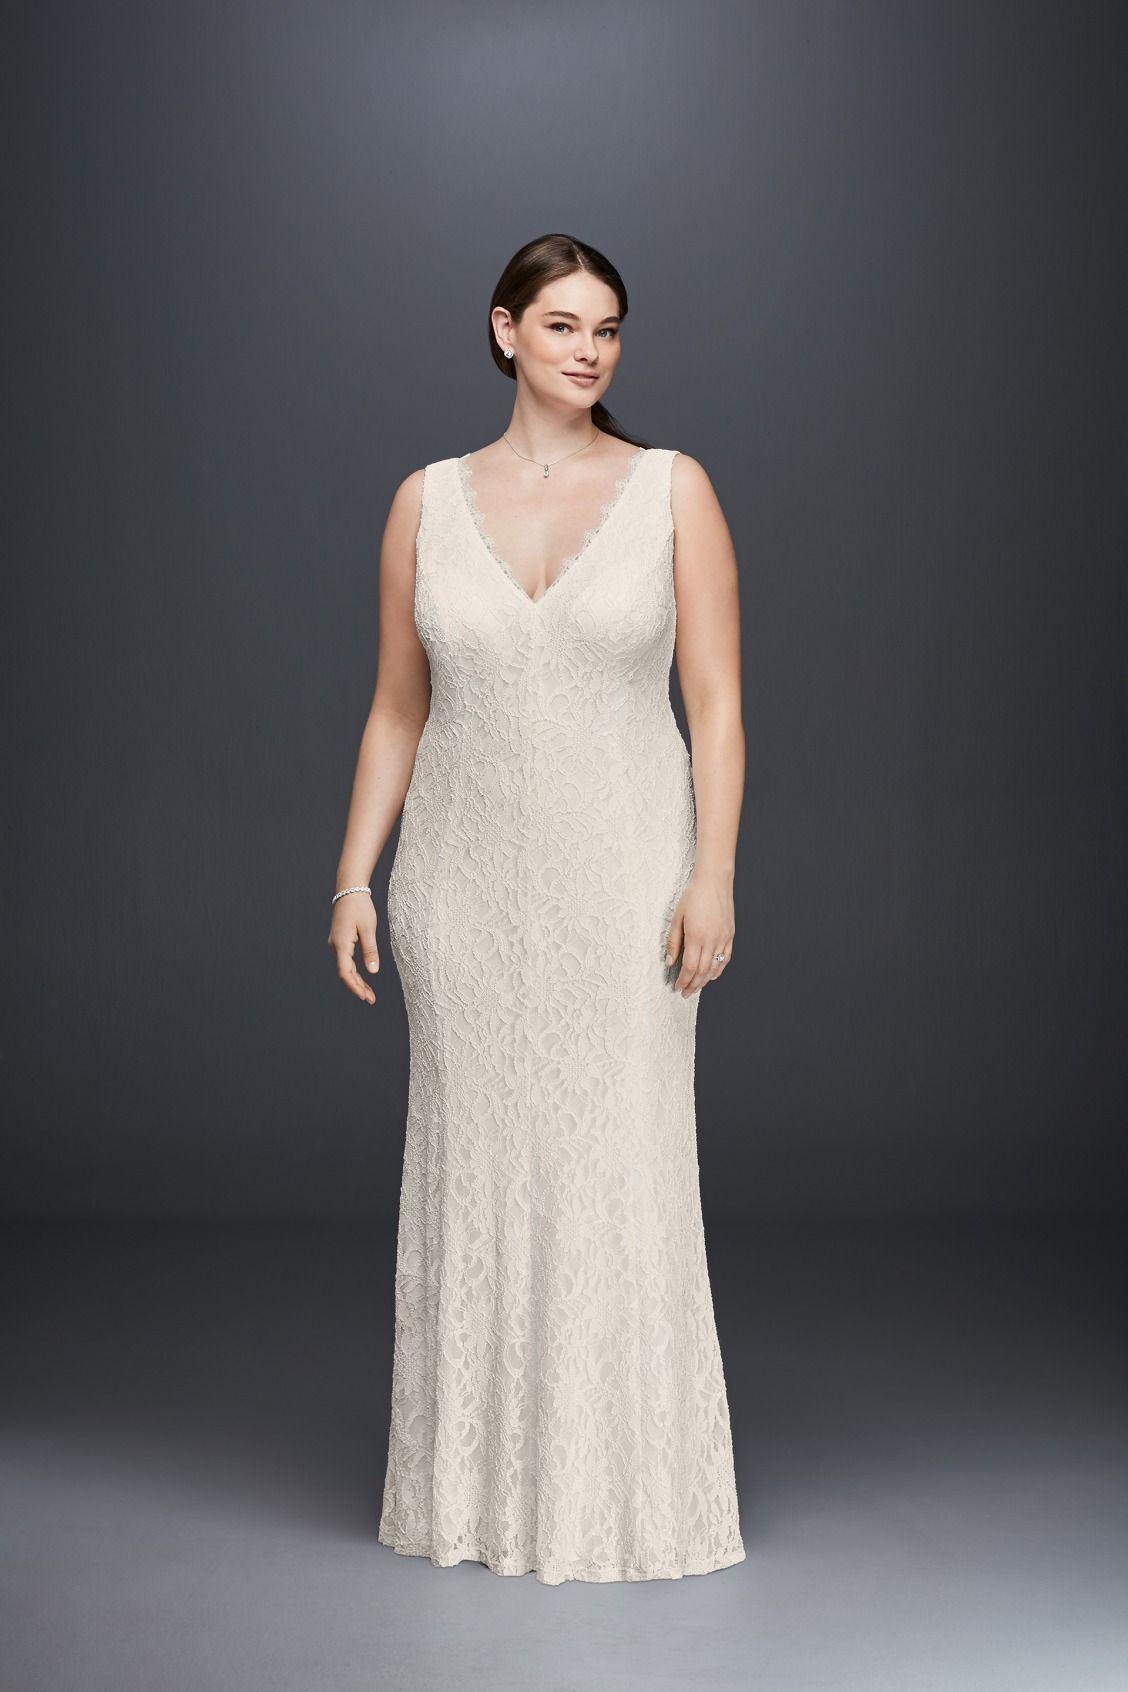 Allover Lace V Neck Plus Size Sheath Wedding Dress By Db Studio